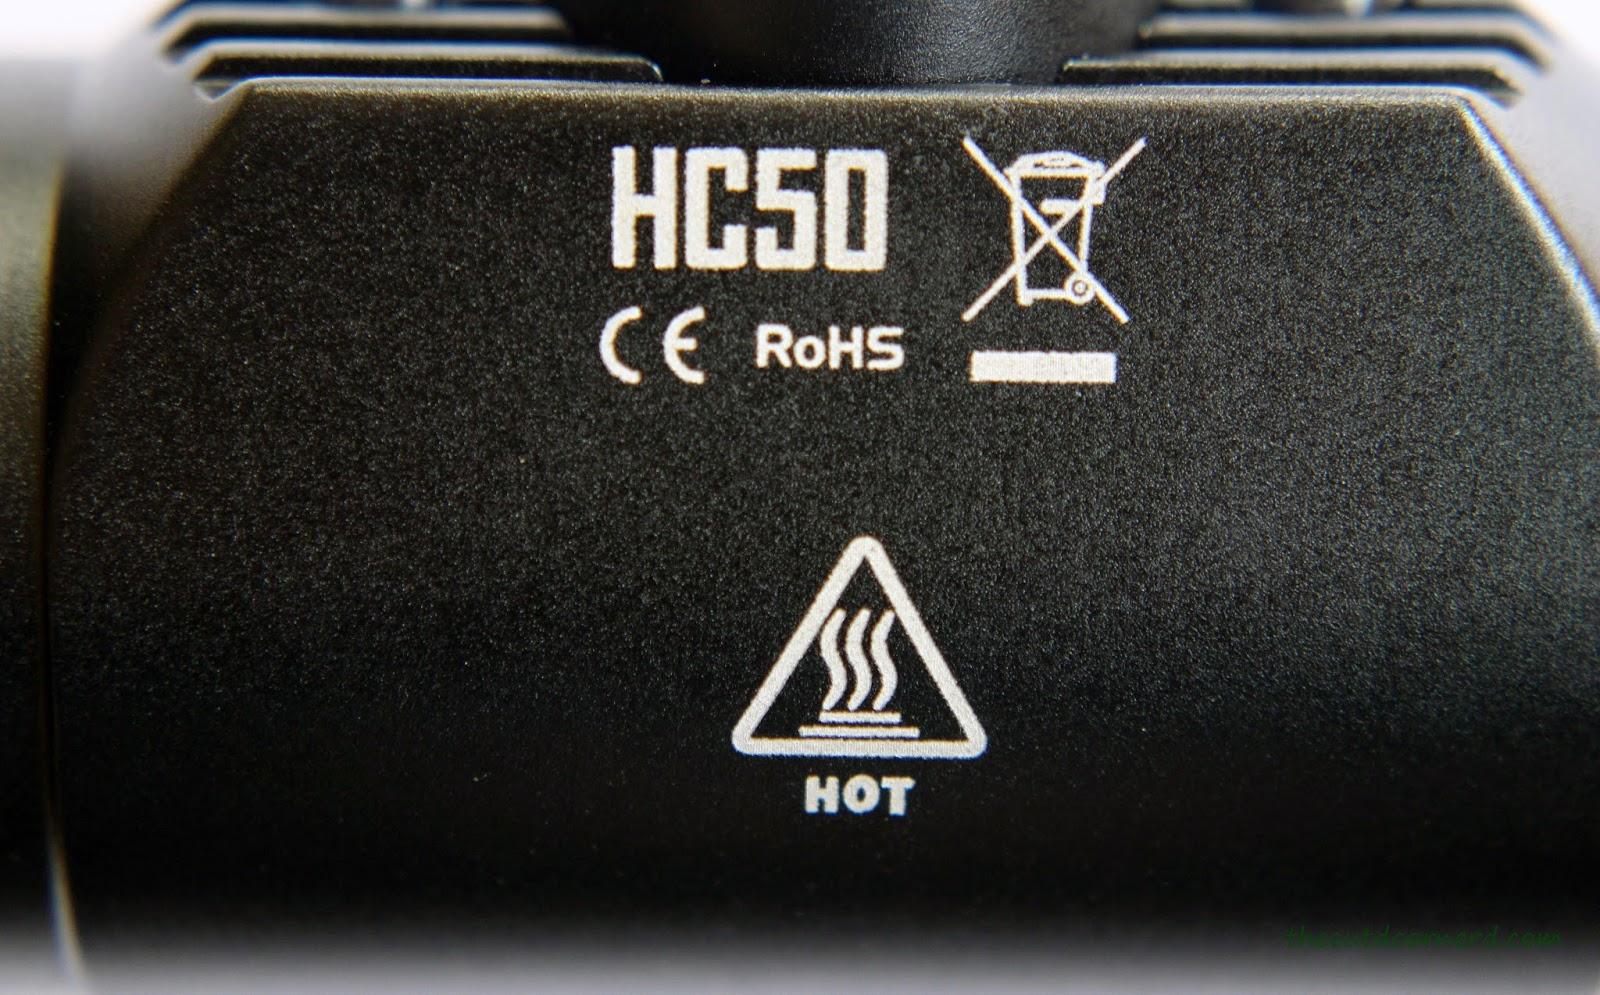 Nitecore HC50 Headlamp Logo Closeup 1